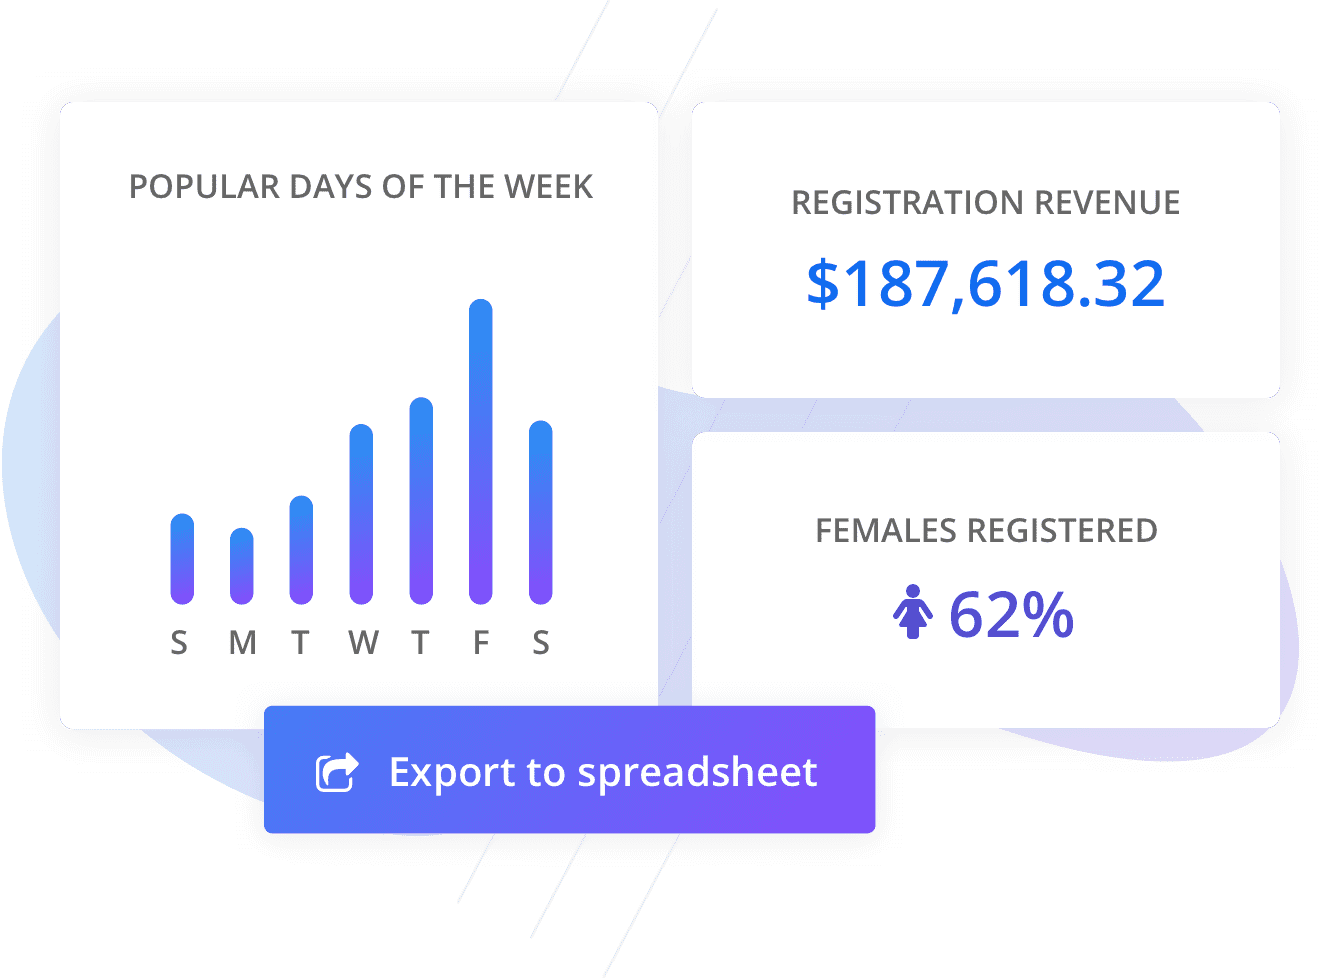 Charts and stats